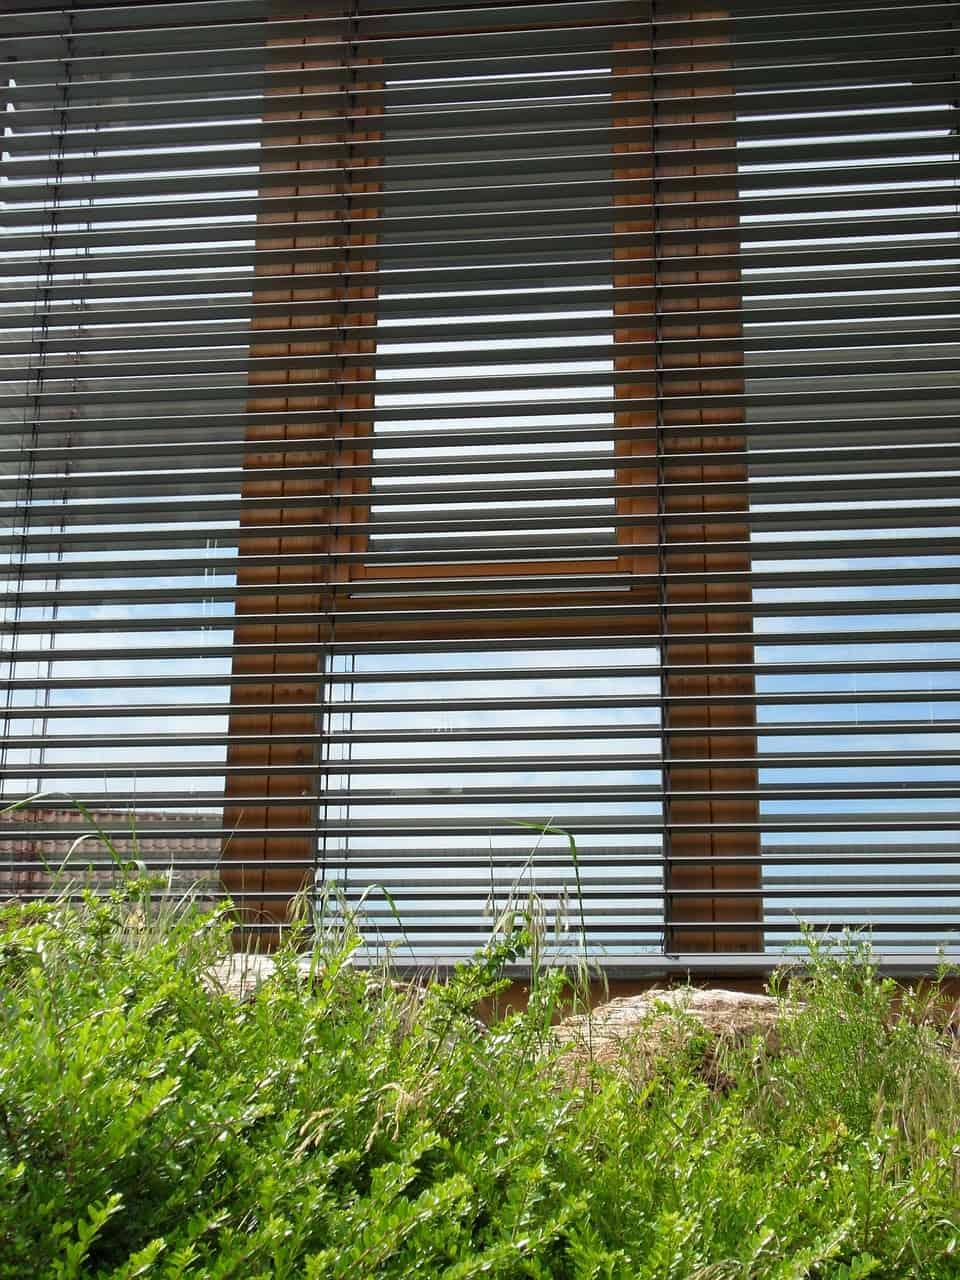 blinds-353871_1280